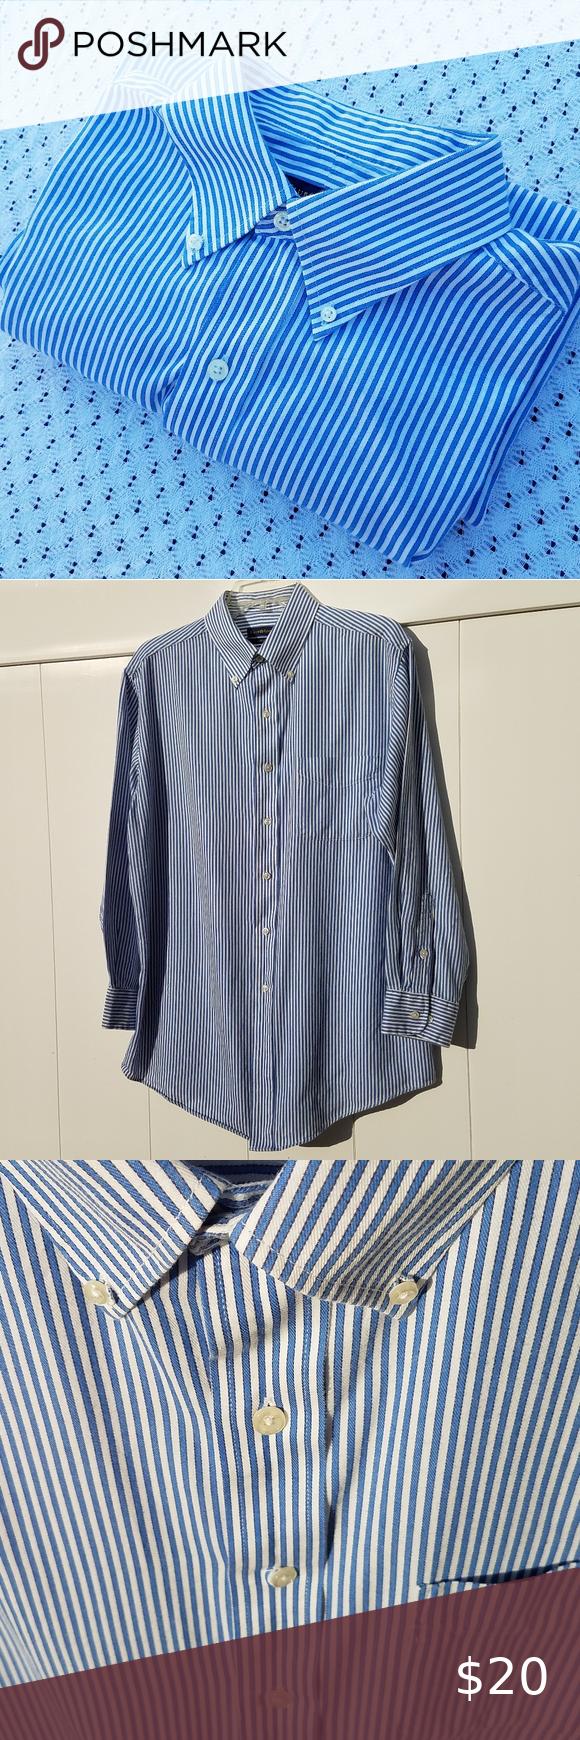 Club Room Easy Care Long Sleeve Button Down Shirt Club Room Easy Care Button Down Long Sleeve Striped Shirt With Bu In 2020 Mens Shirt Dress Button Down Shirt Shirts [ 1740 x 580 Pixel ]